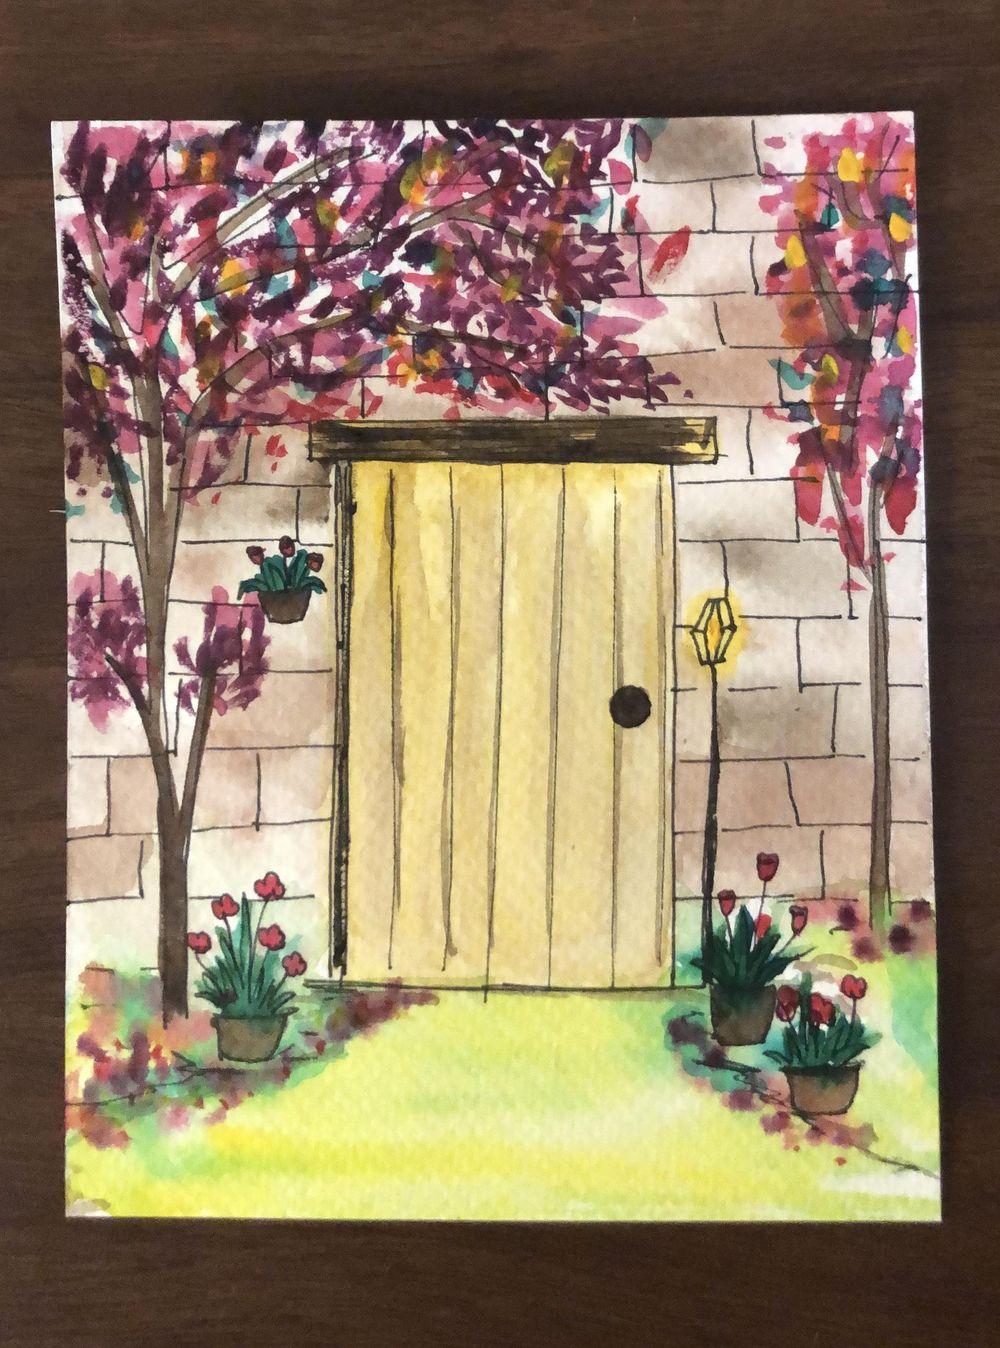 Watercolour door illustrations - image 1 - student project